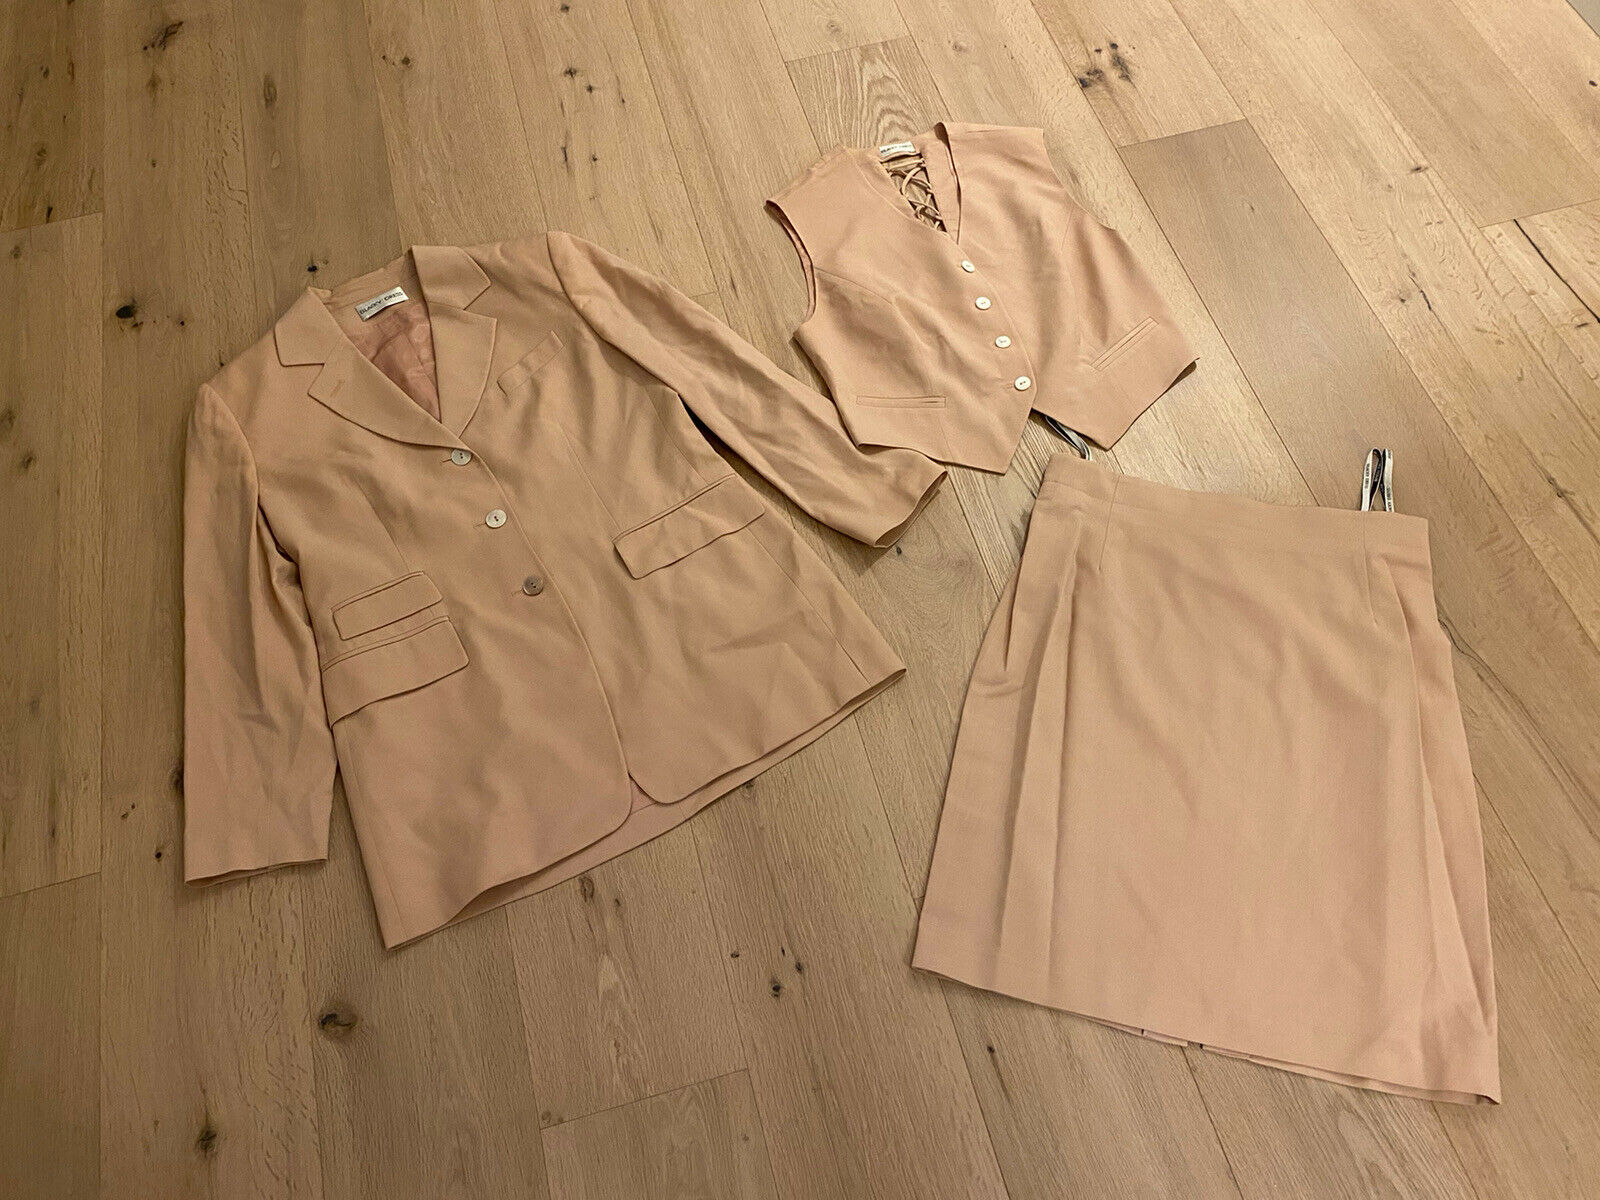 Blacky Dress 3-teiler Rock Blazer Weste Apricot Schurwolle Gr. 42 WIE NEU